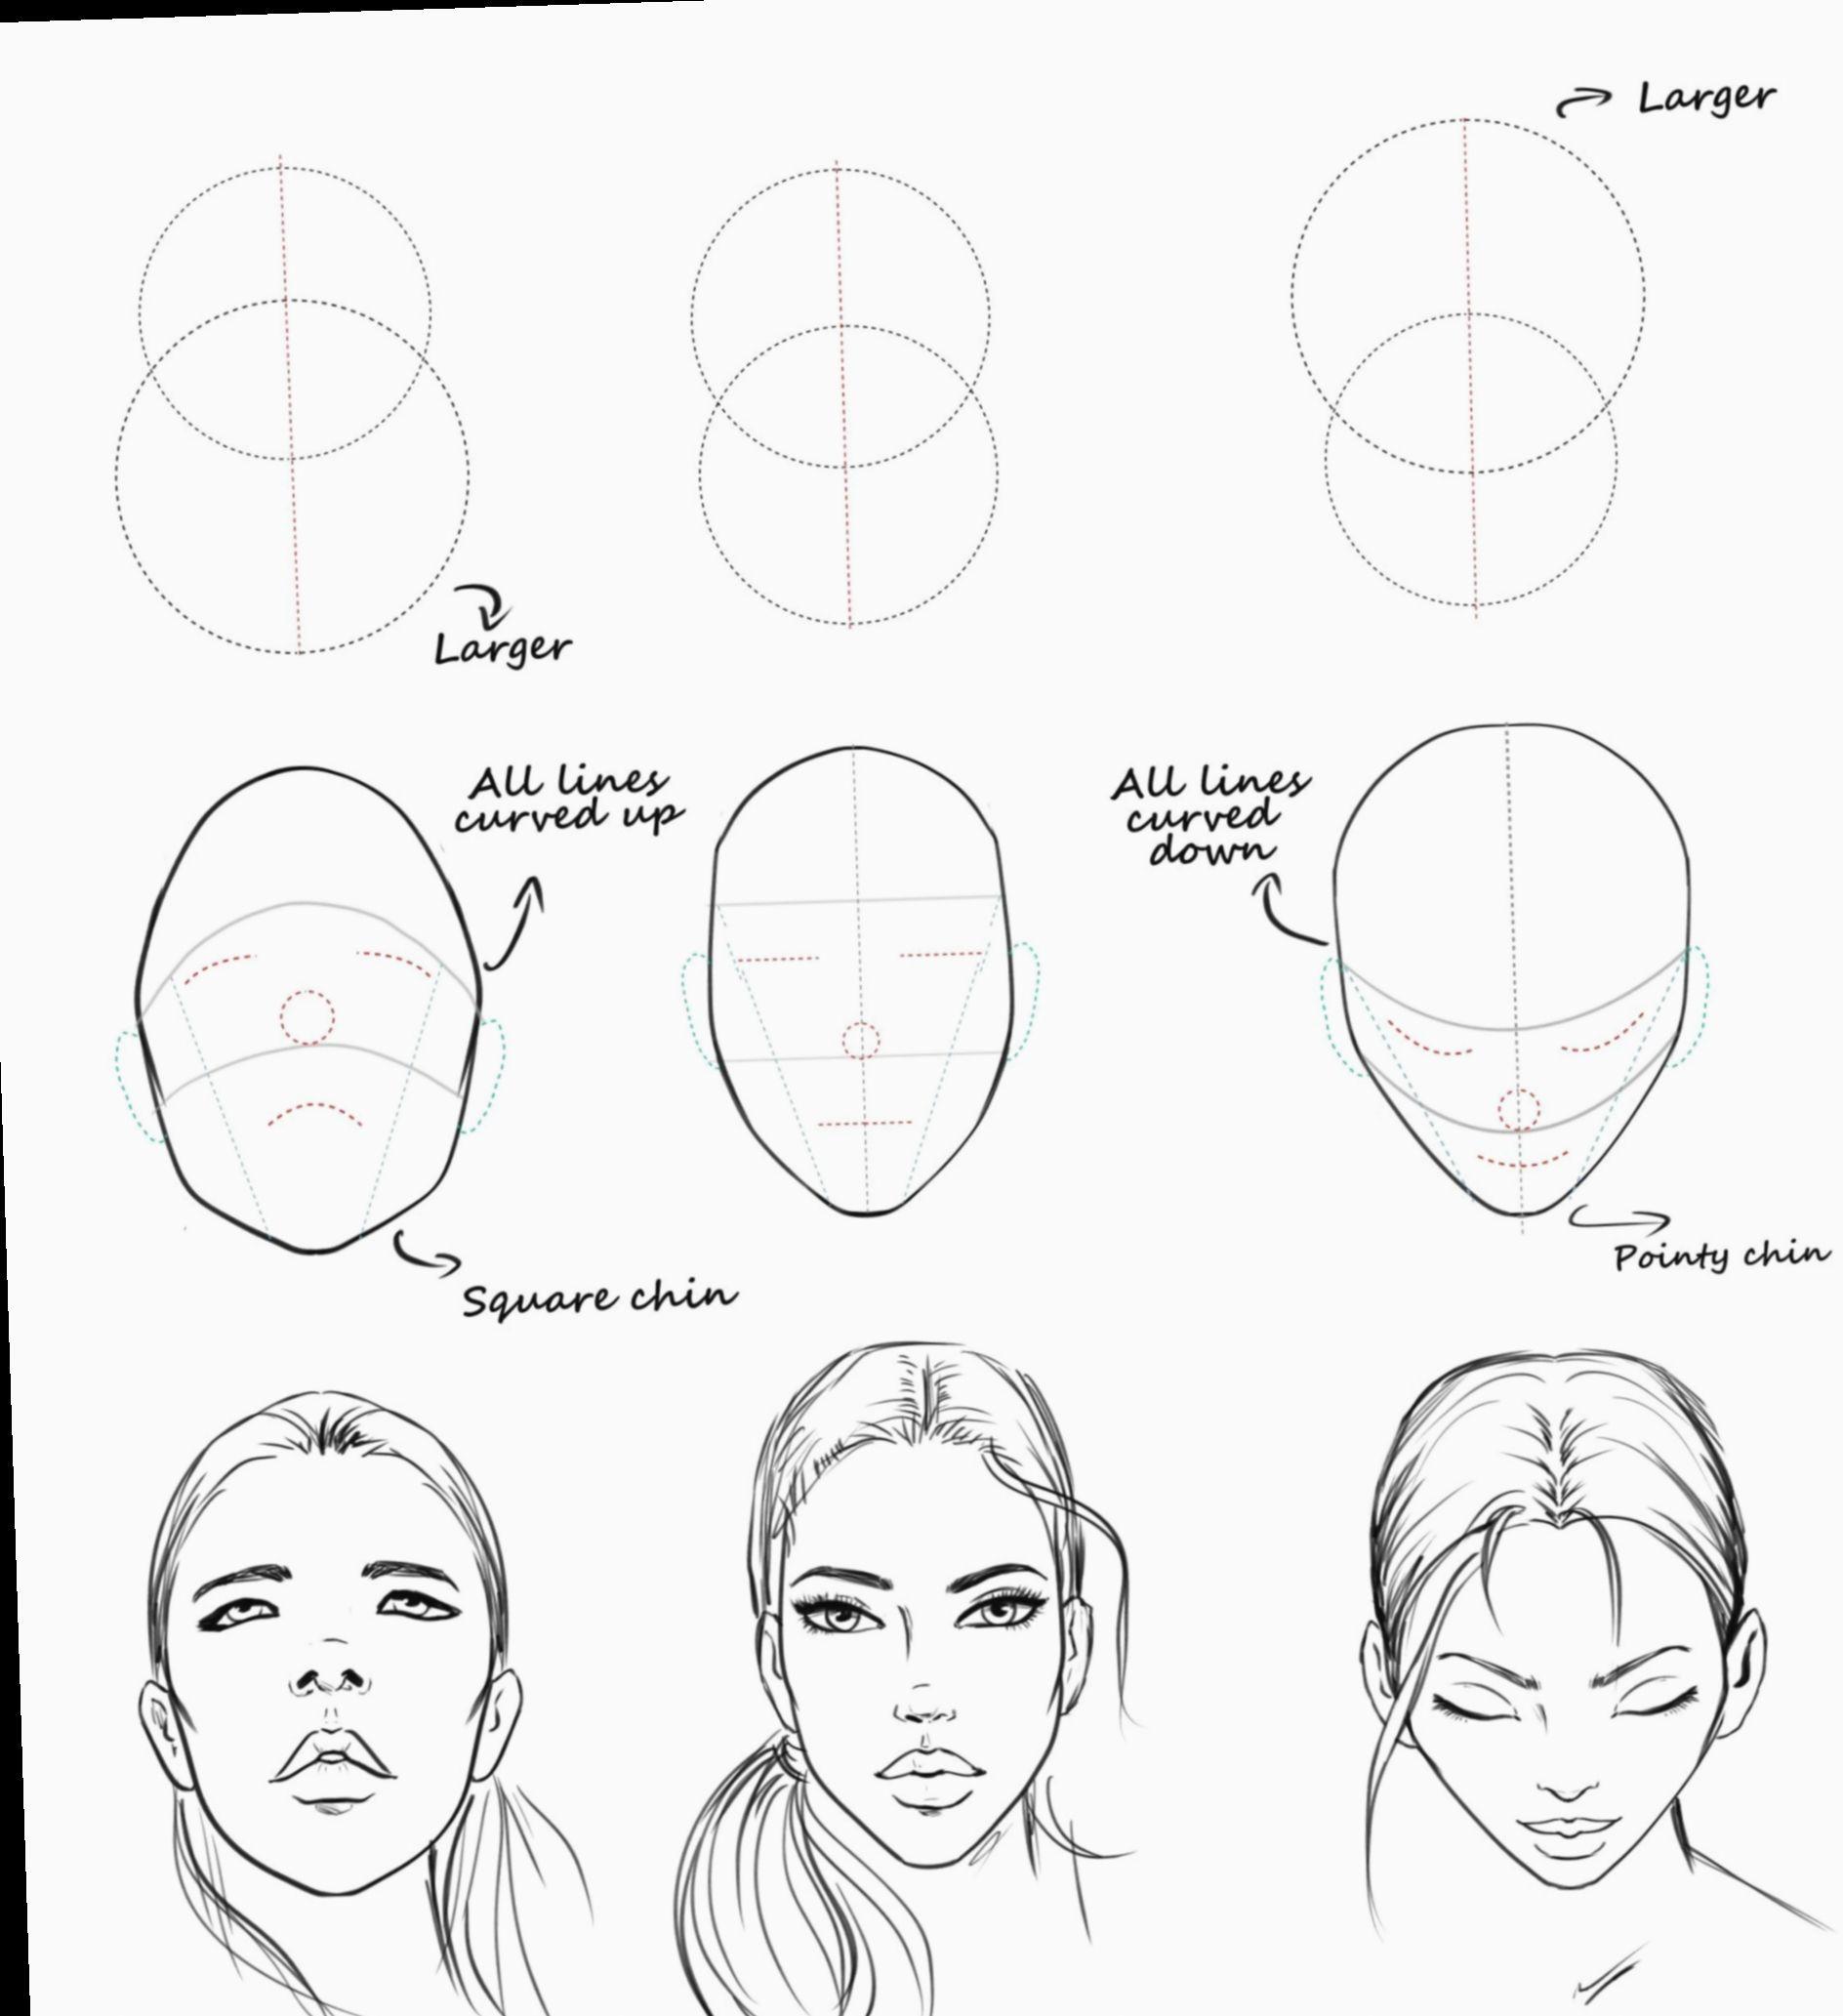 Anime Face Structure Sketch Bakugoukatsuki Bakugou Bnha In 2020 Drawing Tutorial Face Fashion Drawing Tutorial Fashion Drawing